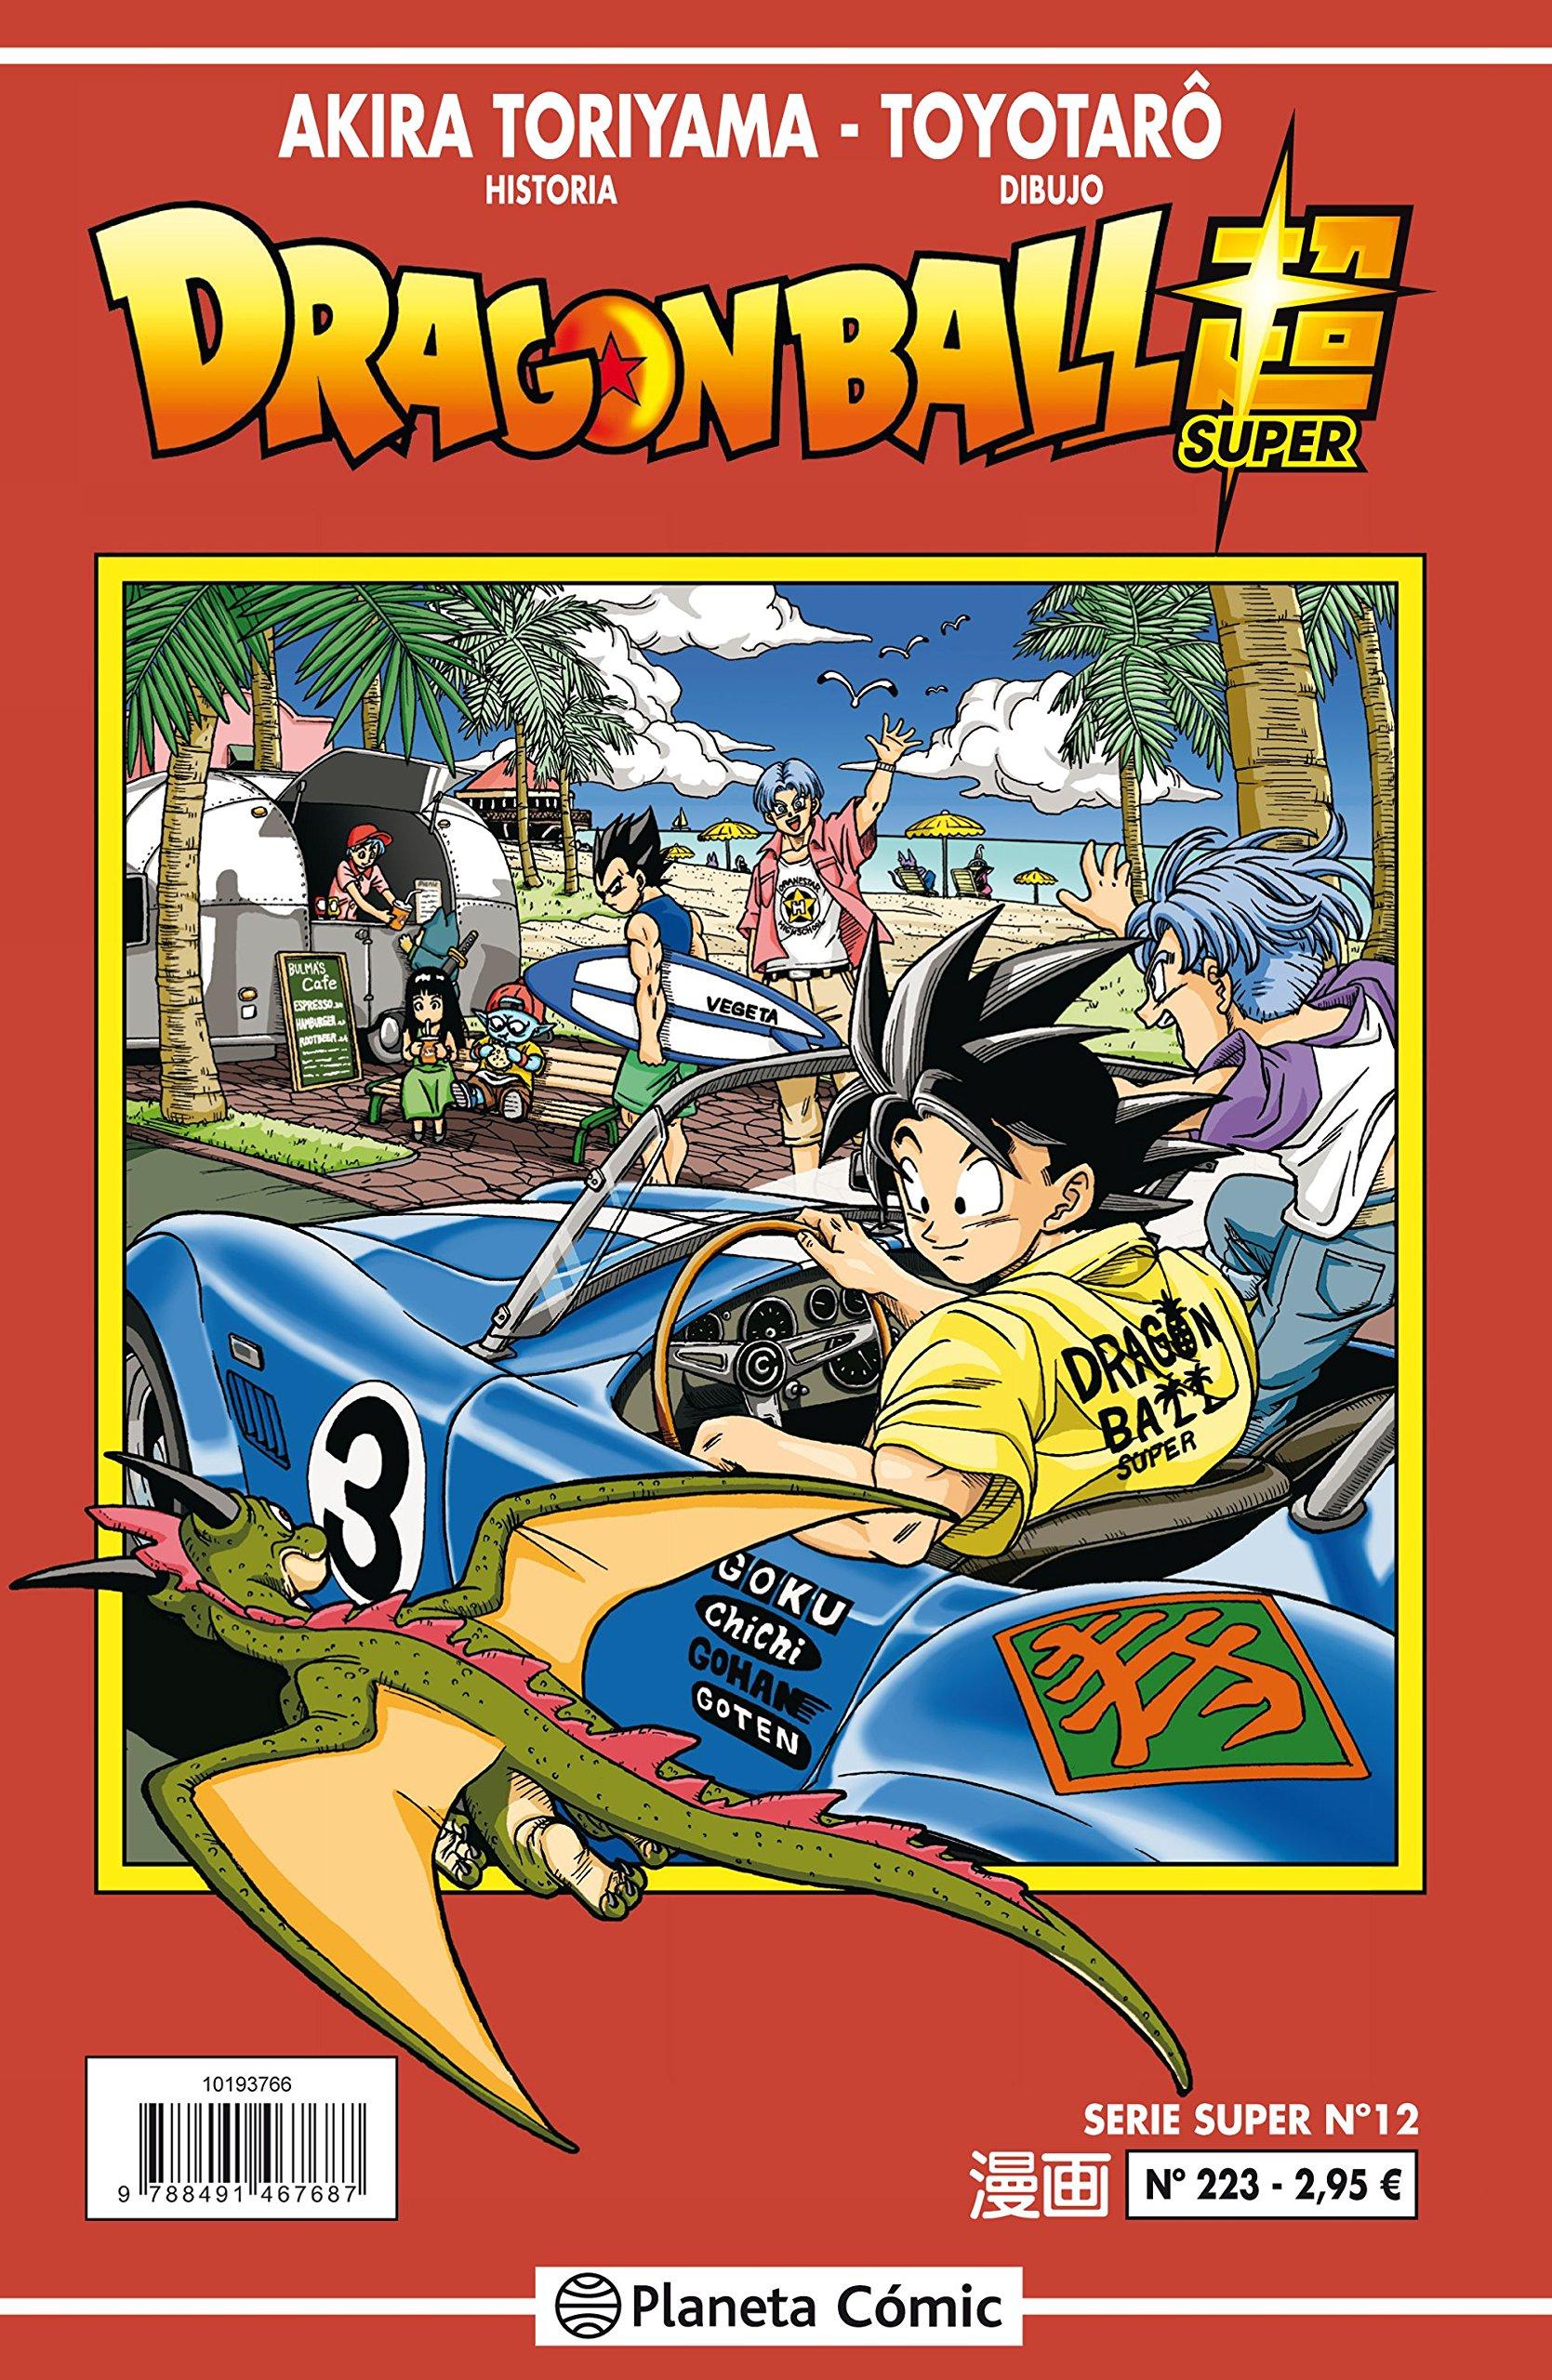 Dragon Ball Serie roja nº 223 (Manga Shonen) Tapa blanda – 2 oct 2018 Akira Toriyama Daruma Planeta DeAgostini Cómics 8491731350